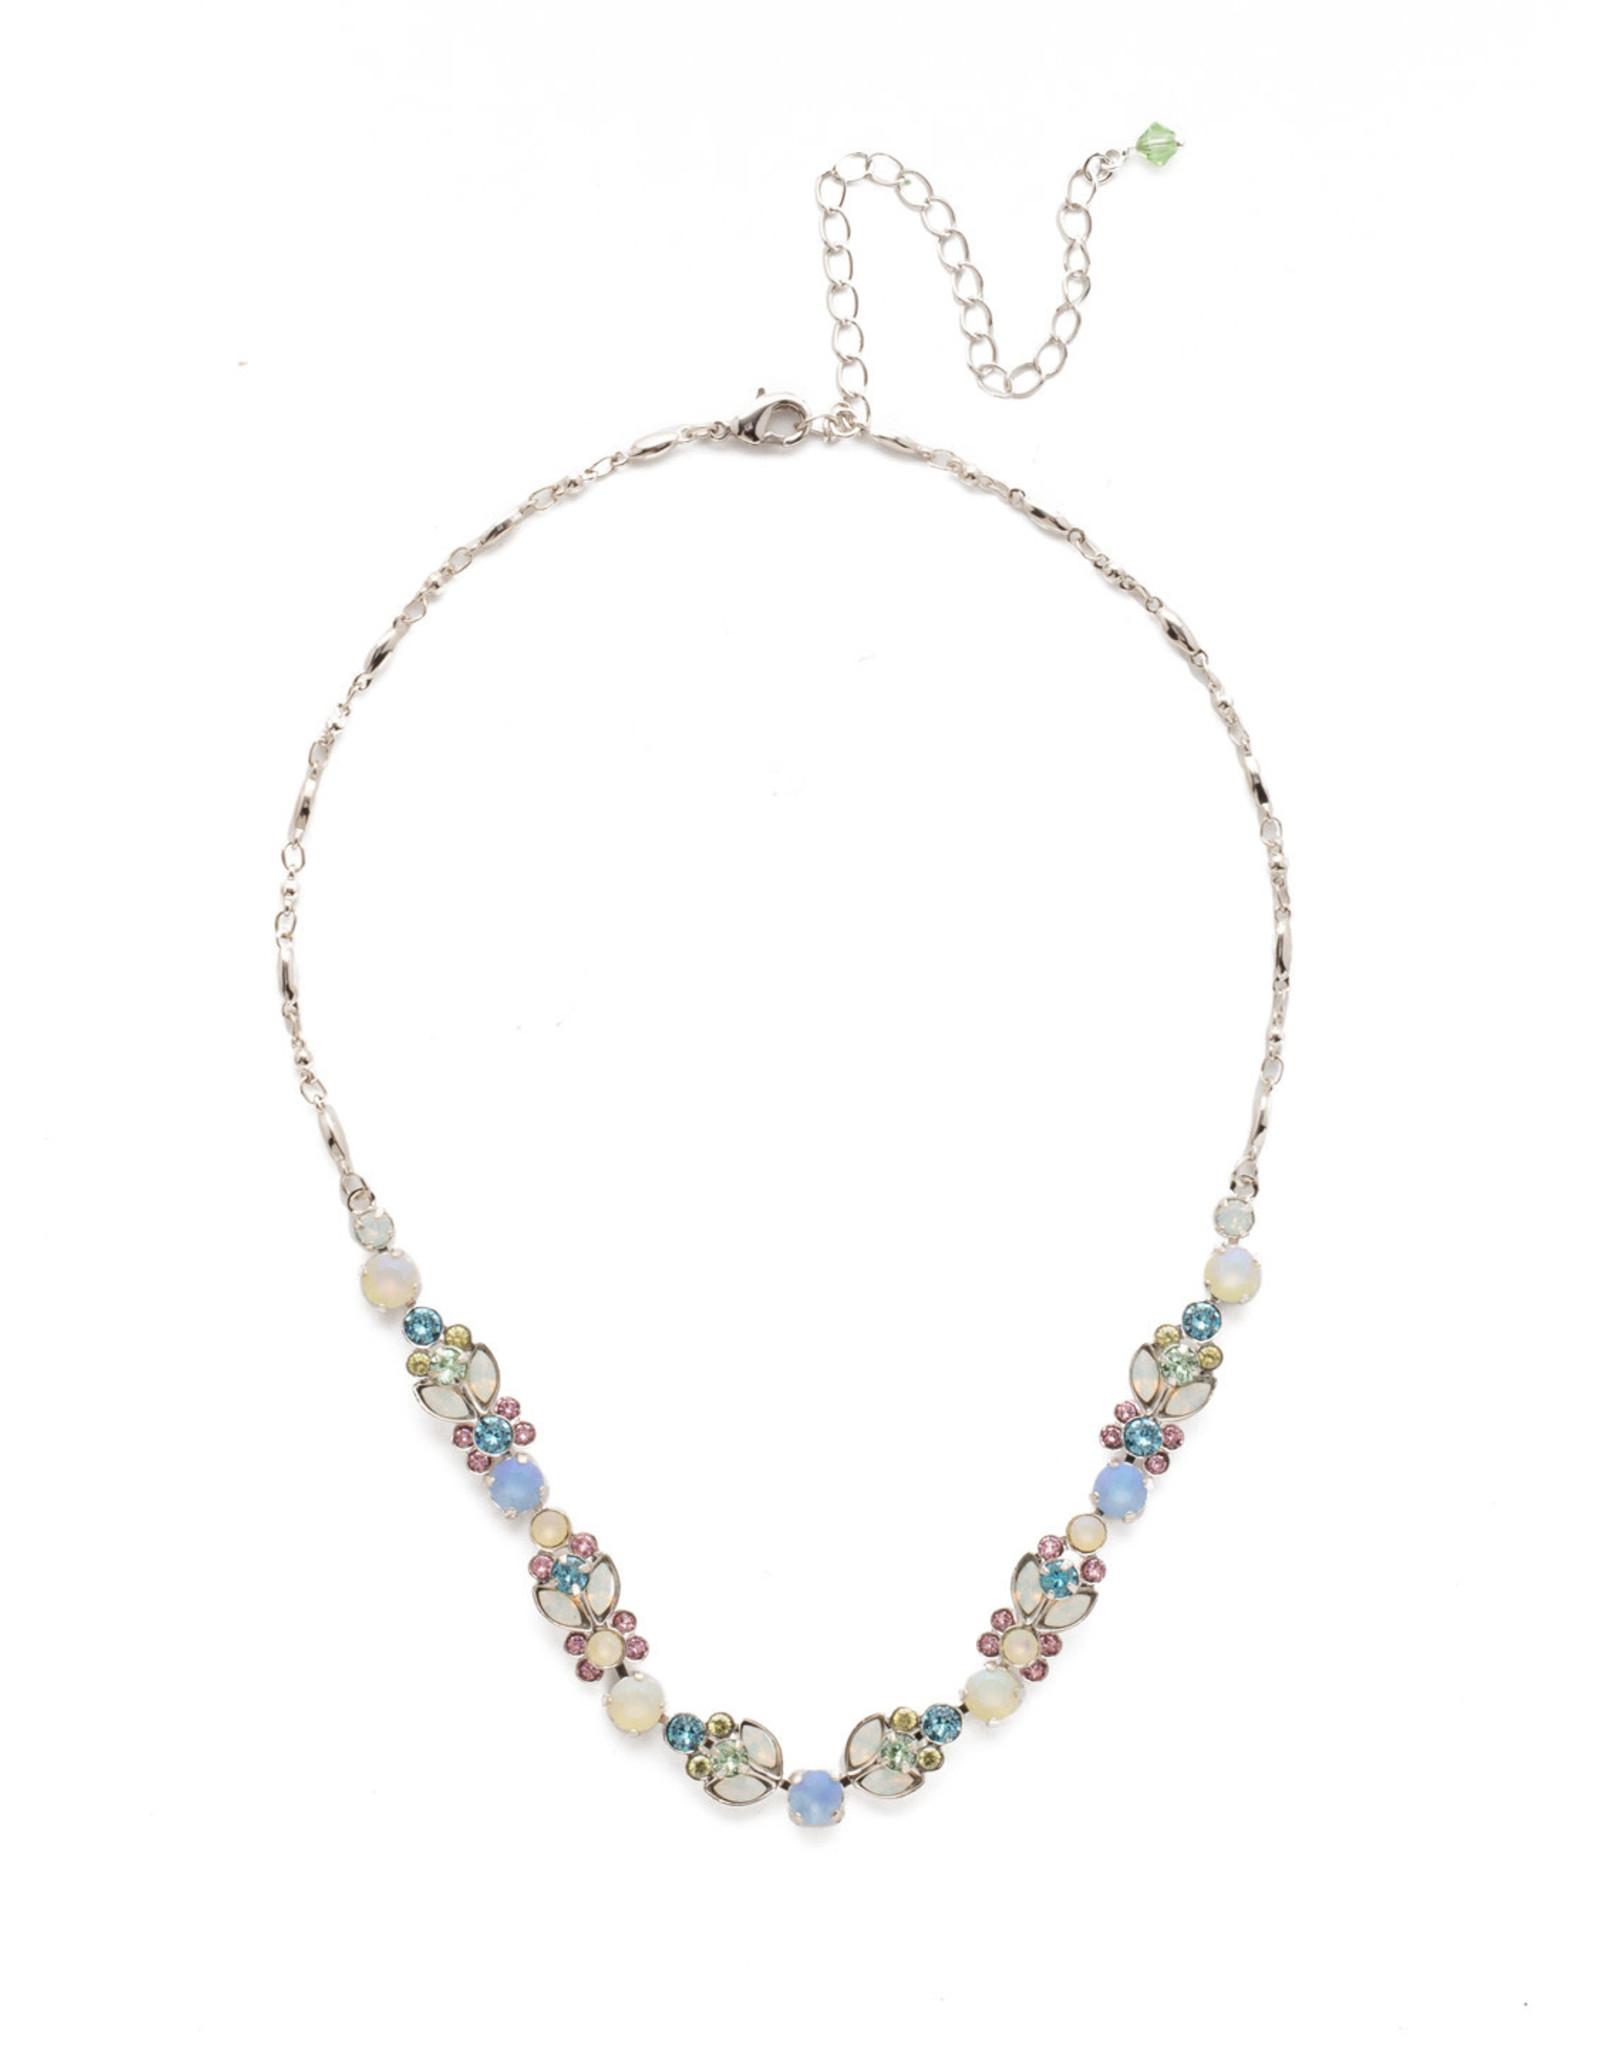 Sorrelli Sorrelli Terina Classic Line Necklace in Rhodium Seersucker